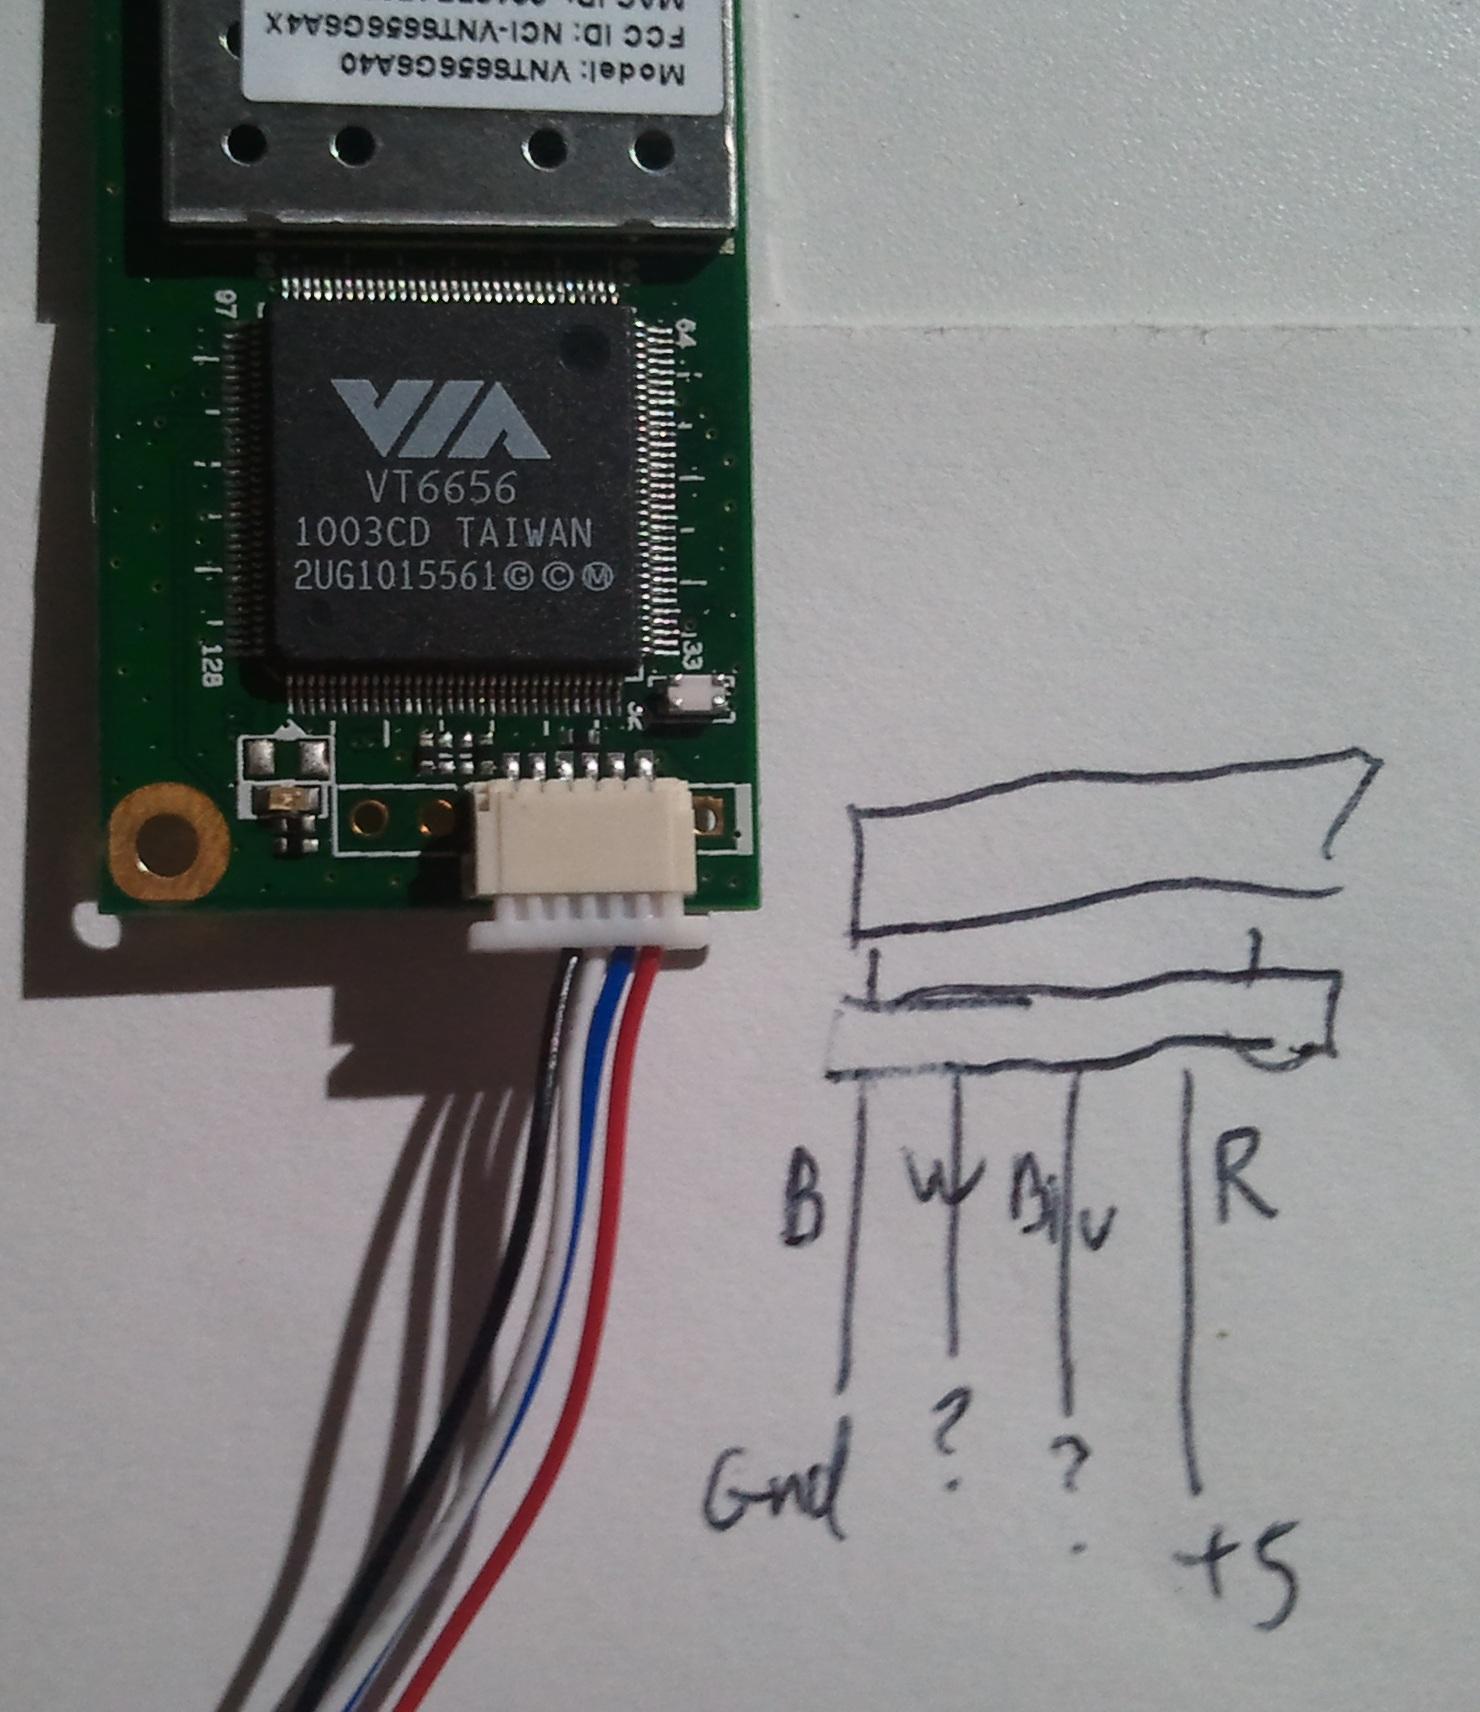 usb web camera wiring diagram 4 lead ekg placement repair the wifi on your foscam fi8904 fi8905 or maygion